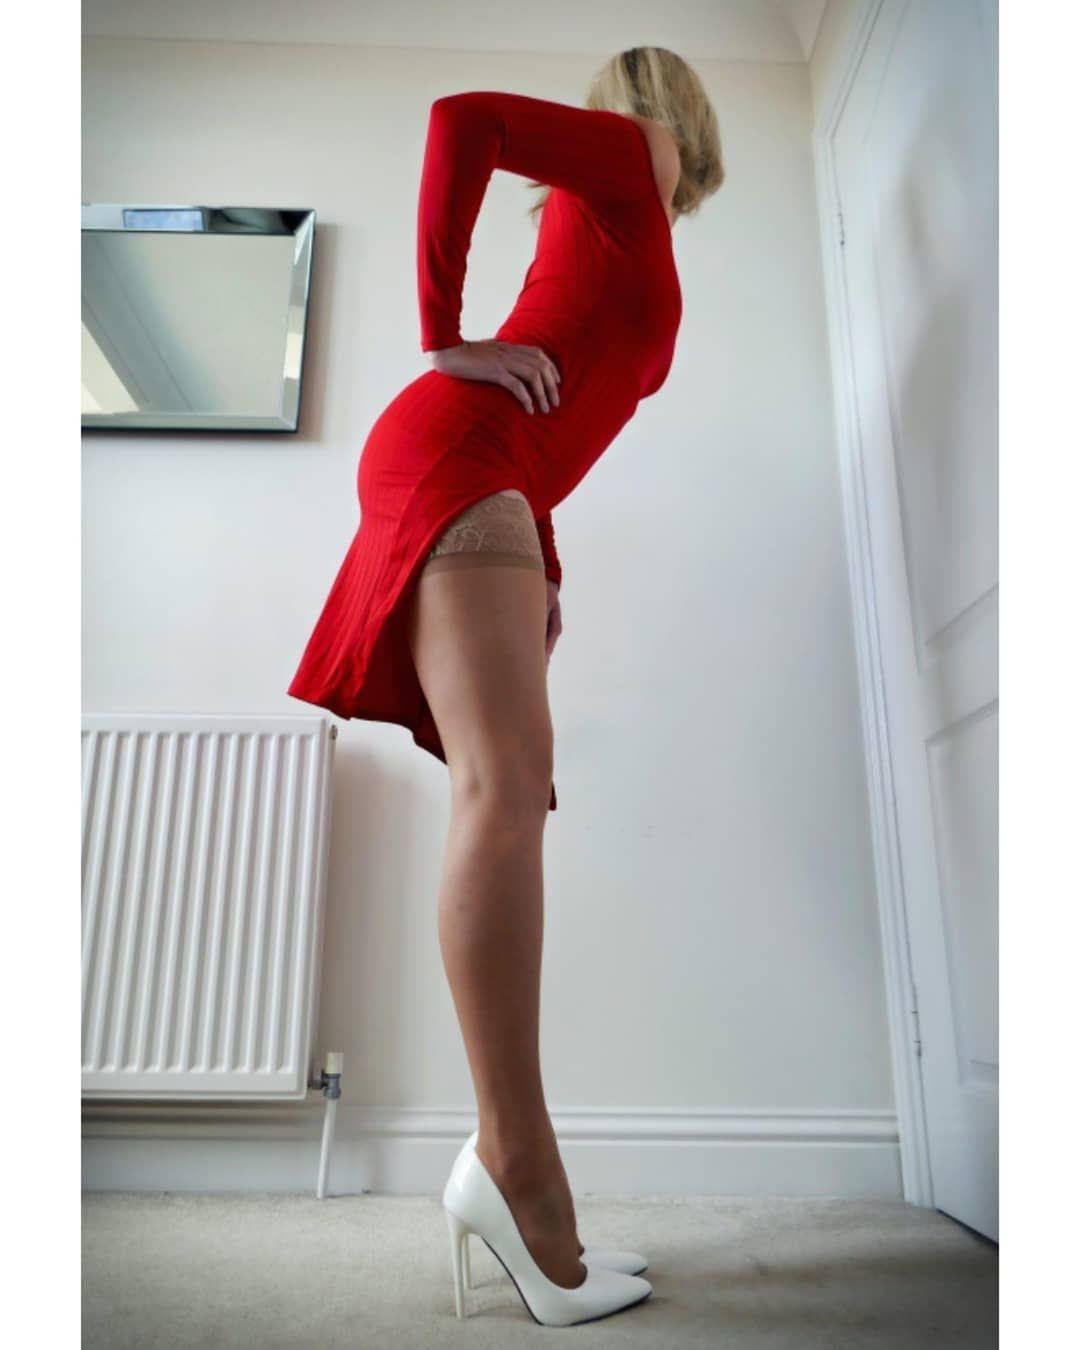 Legshow From LEG